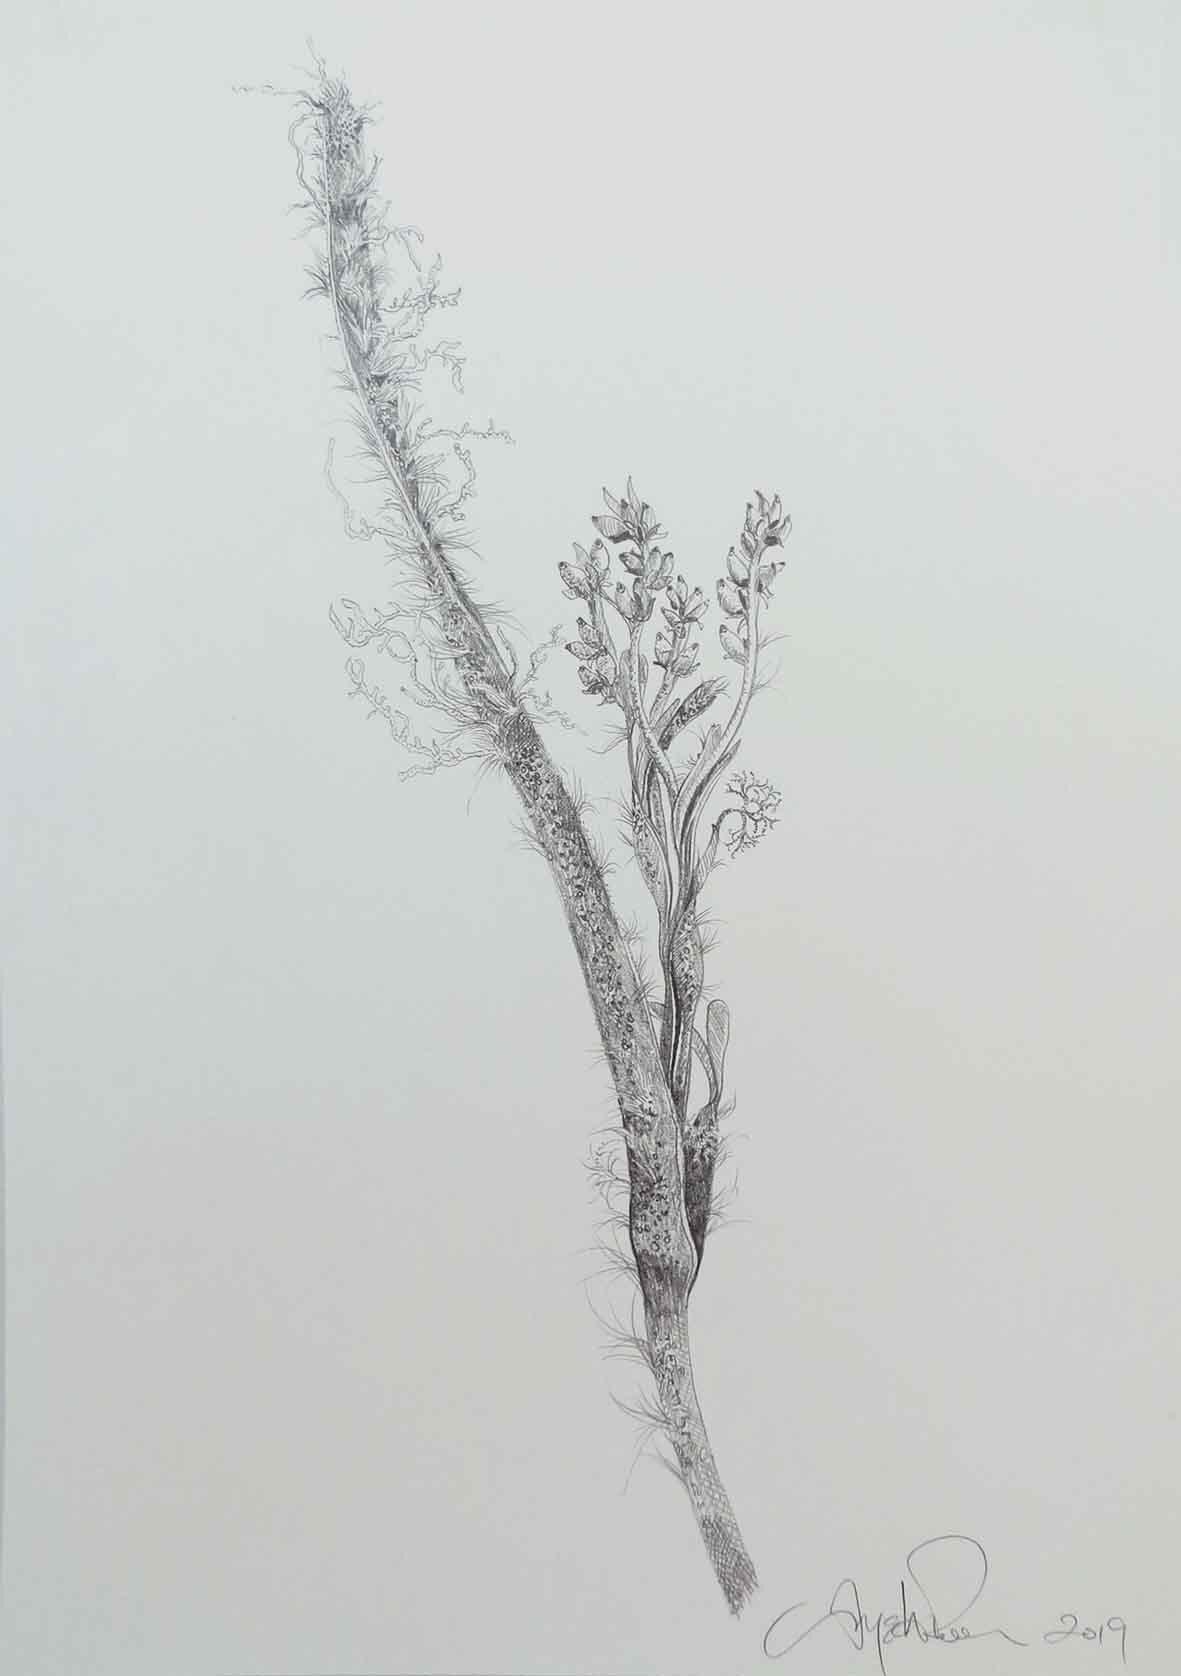 41. Angela Rossen, Posidonia australis red phase flower, 2019, pencil on paper, 42 x 30 cm $1,050